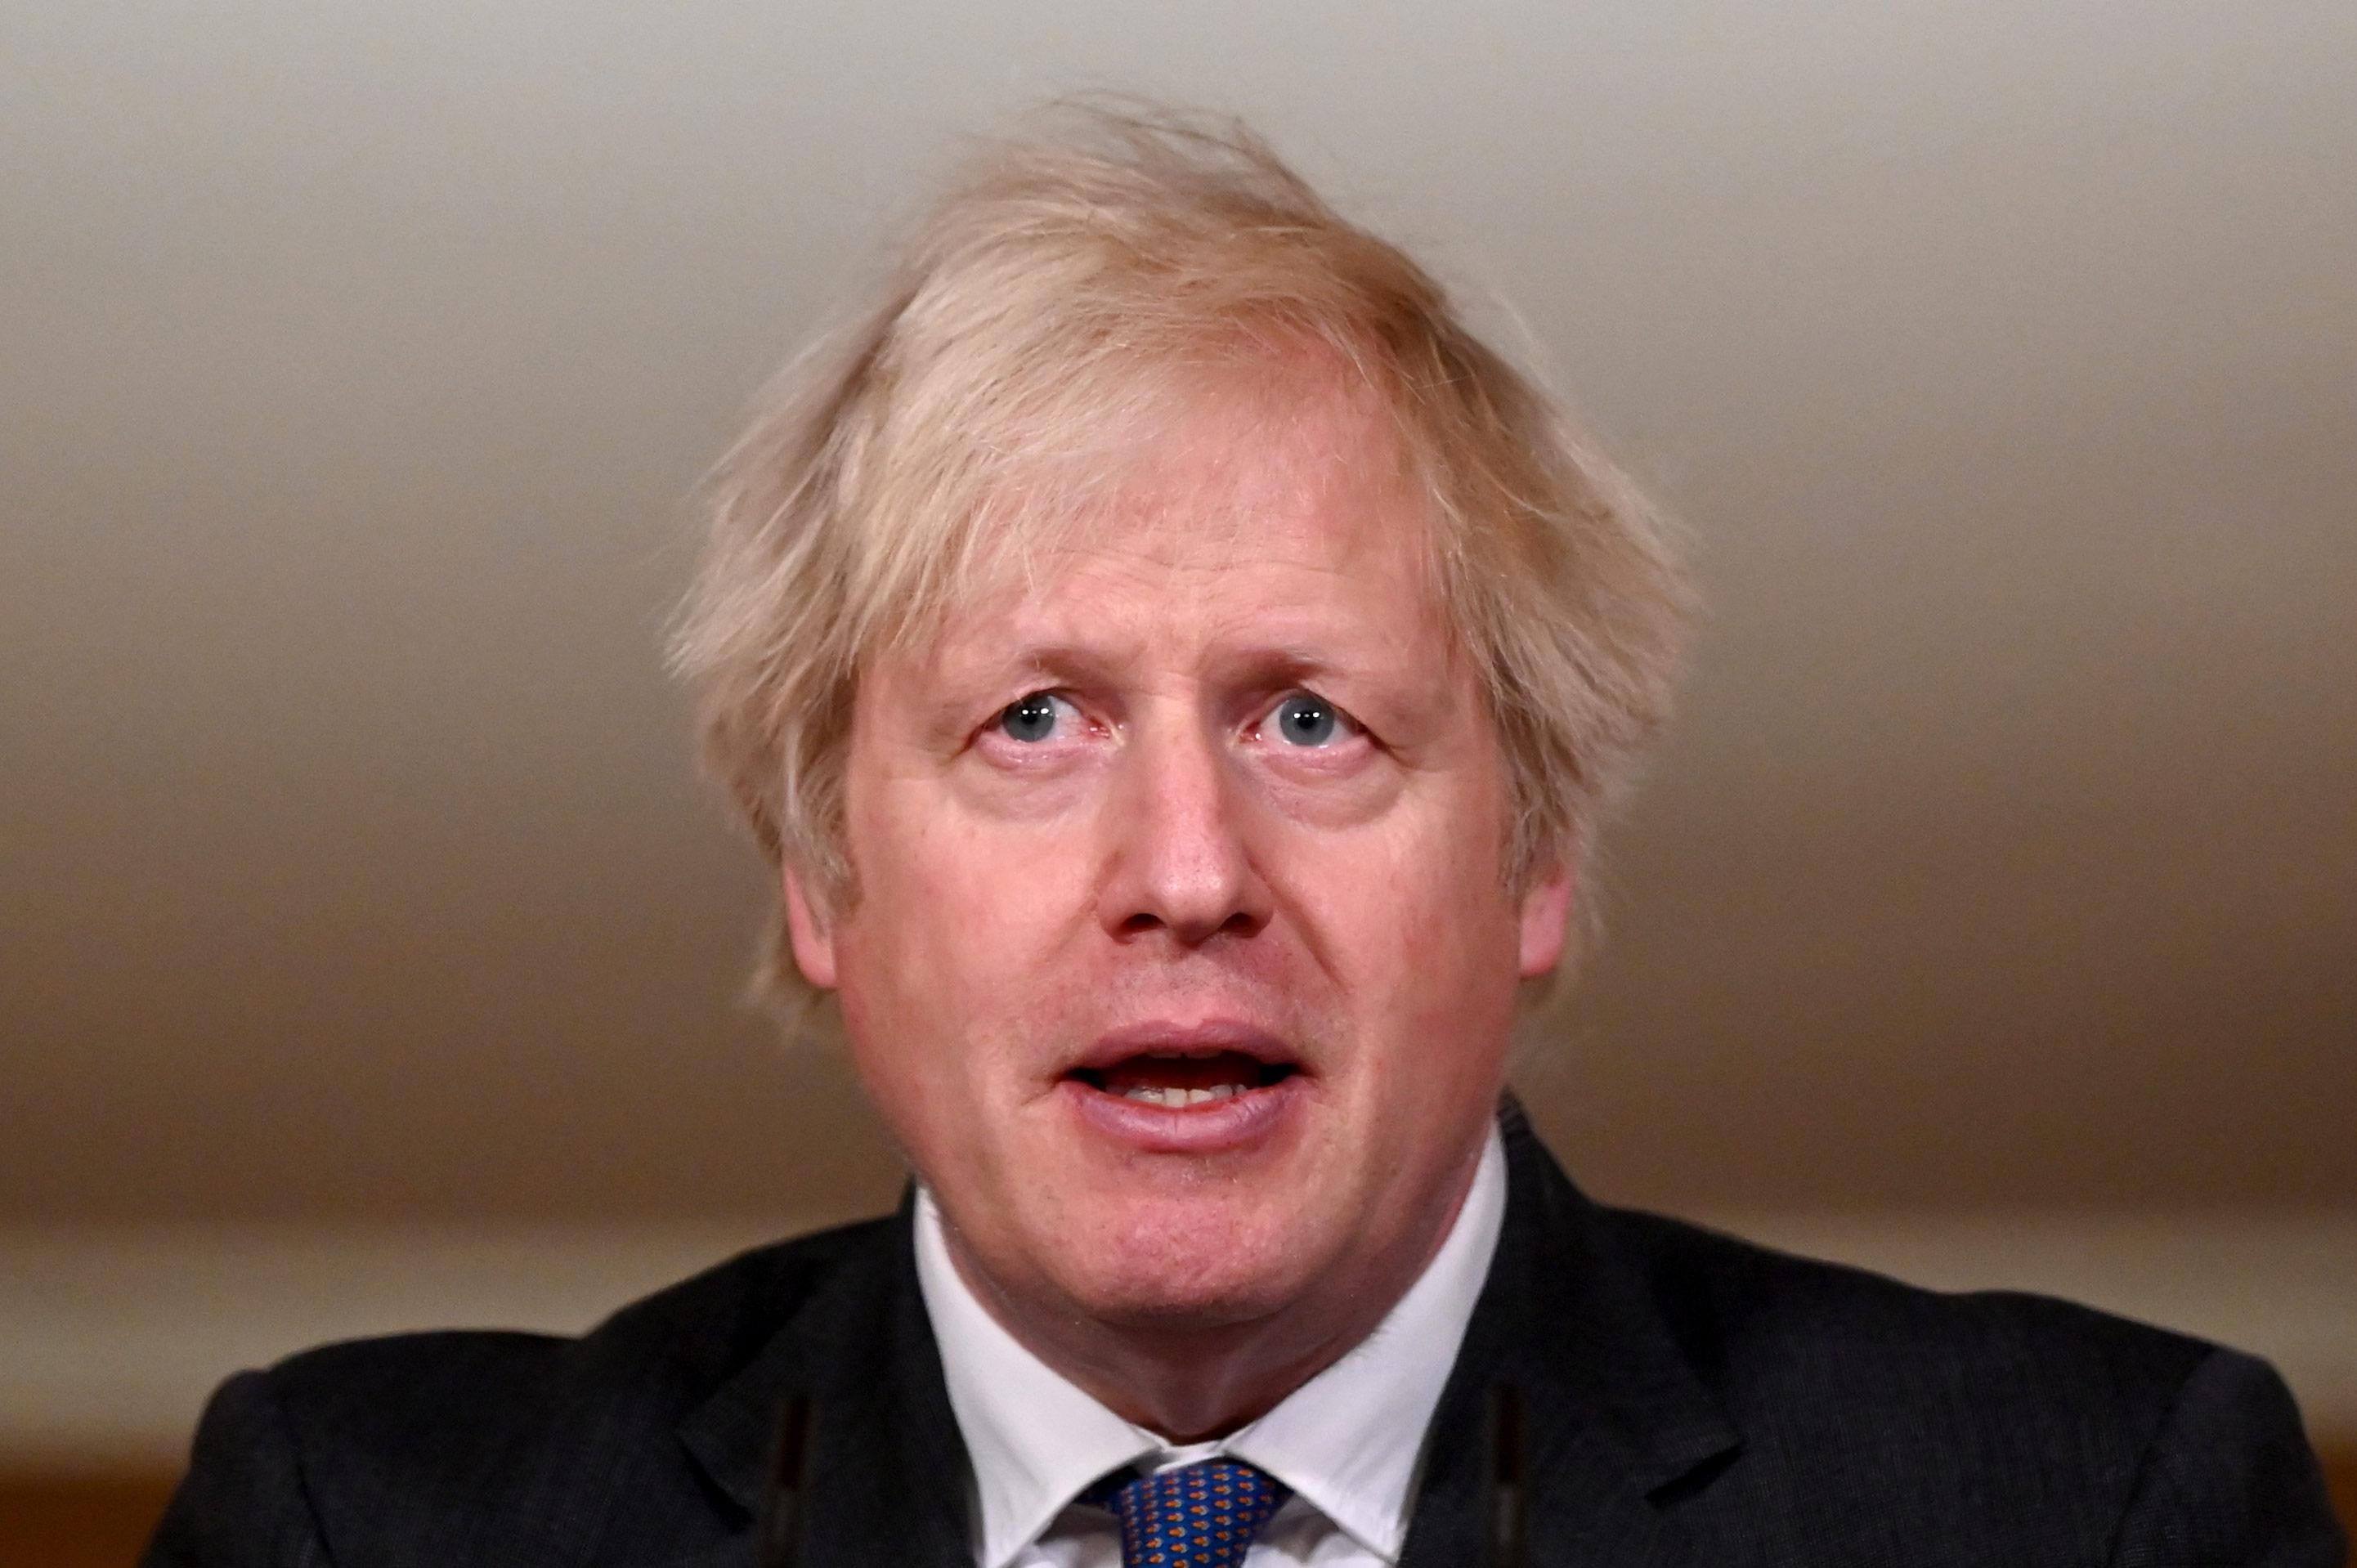 UK Prime Minister Boris Johnson speaks during a coronavirus press conference at 10 Downing Street on January 22, in London.